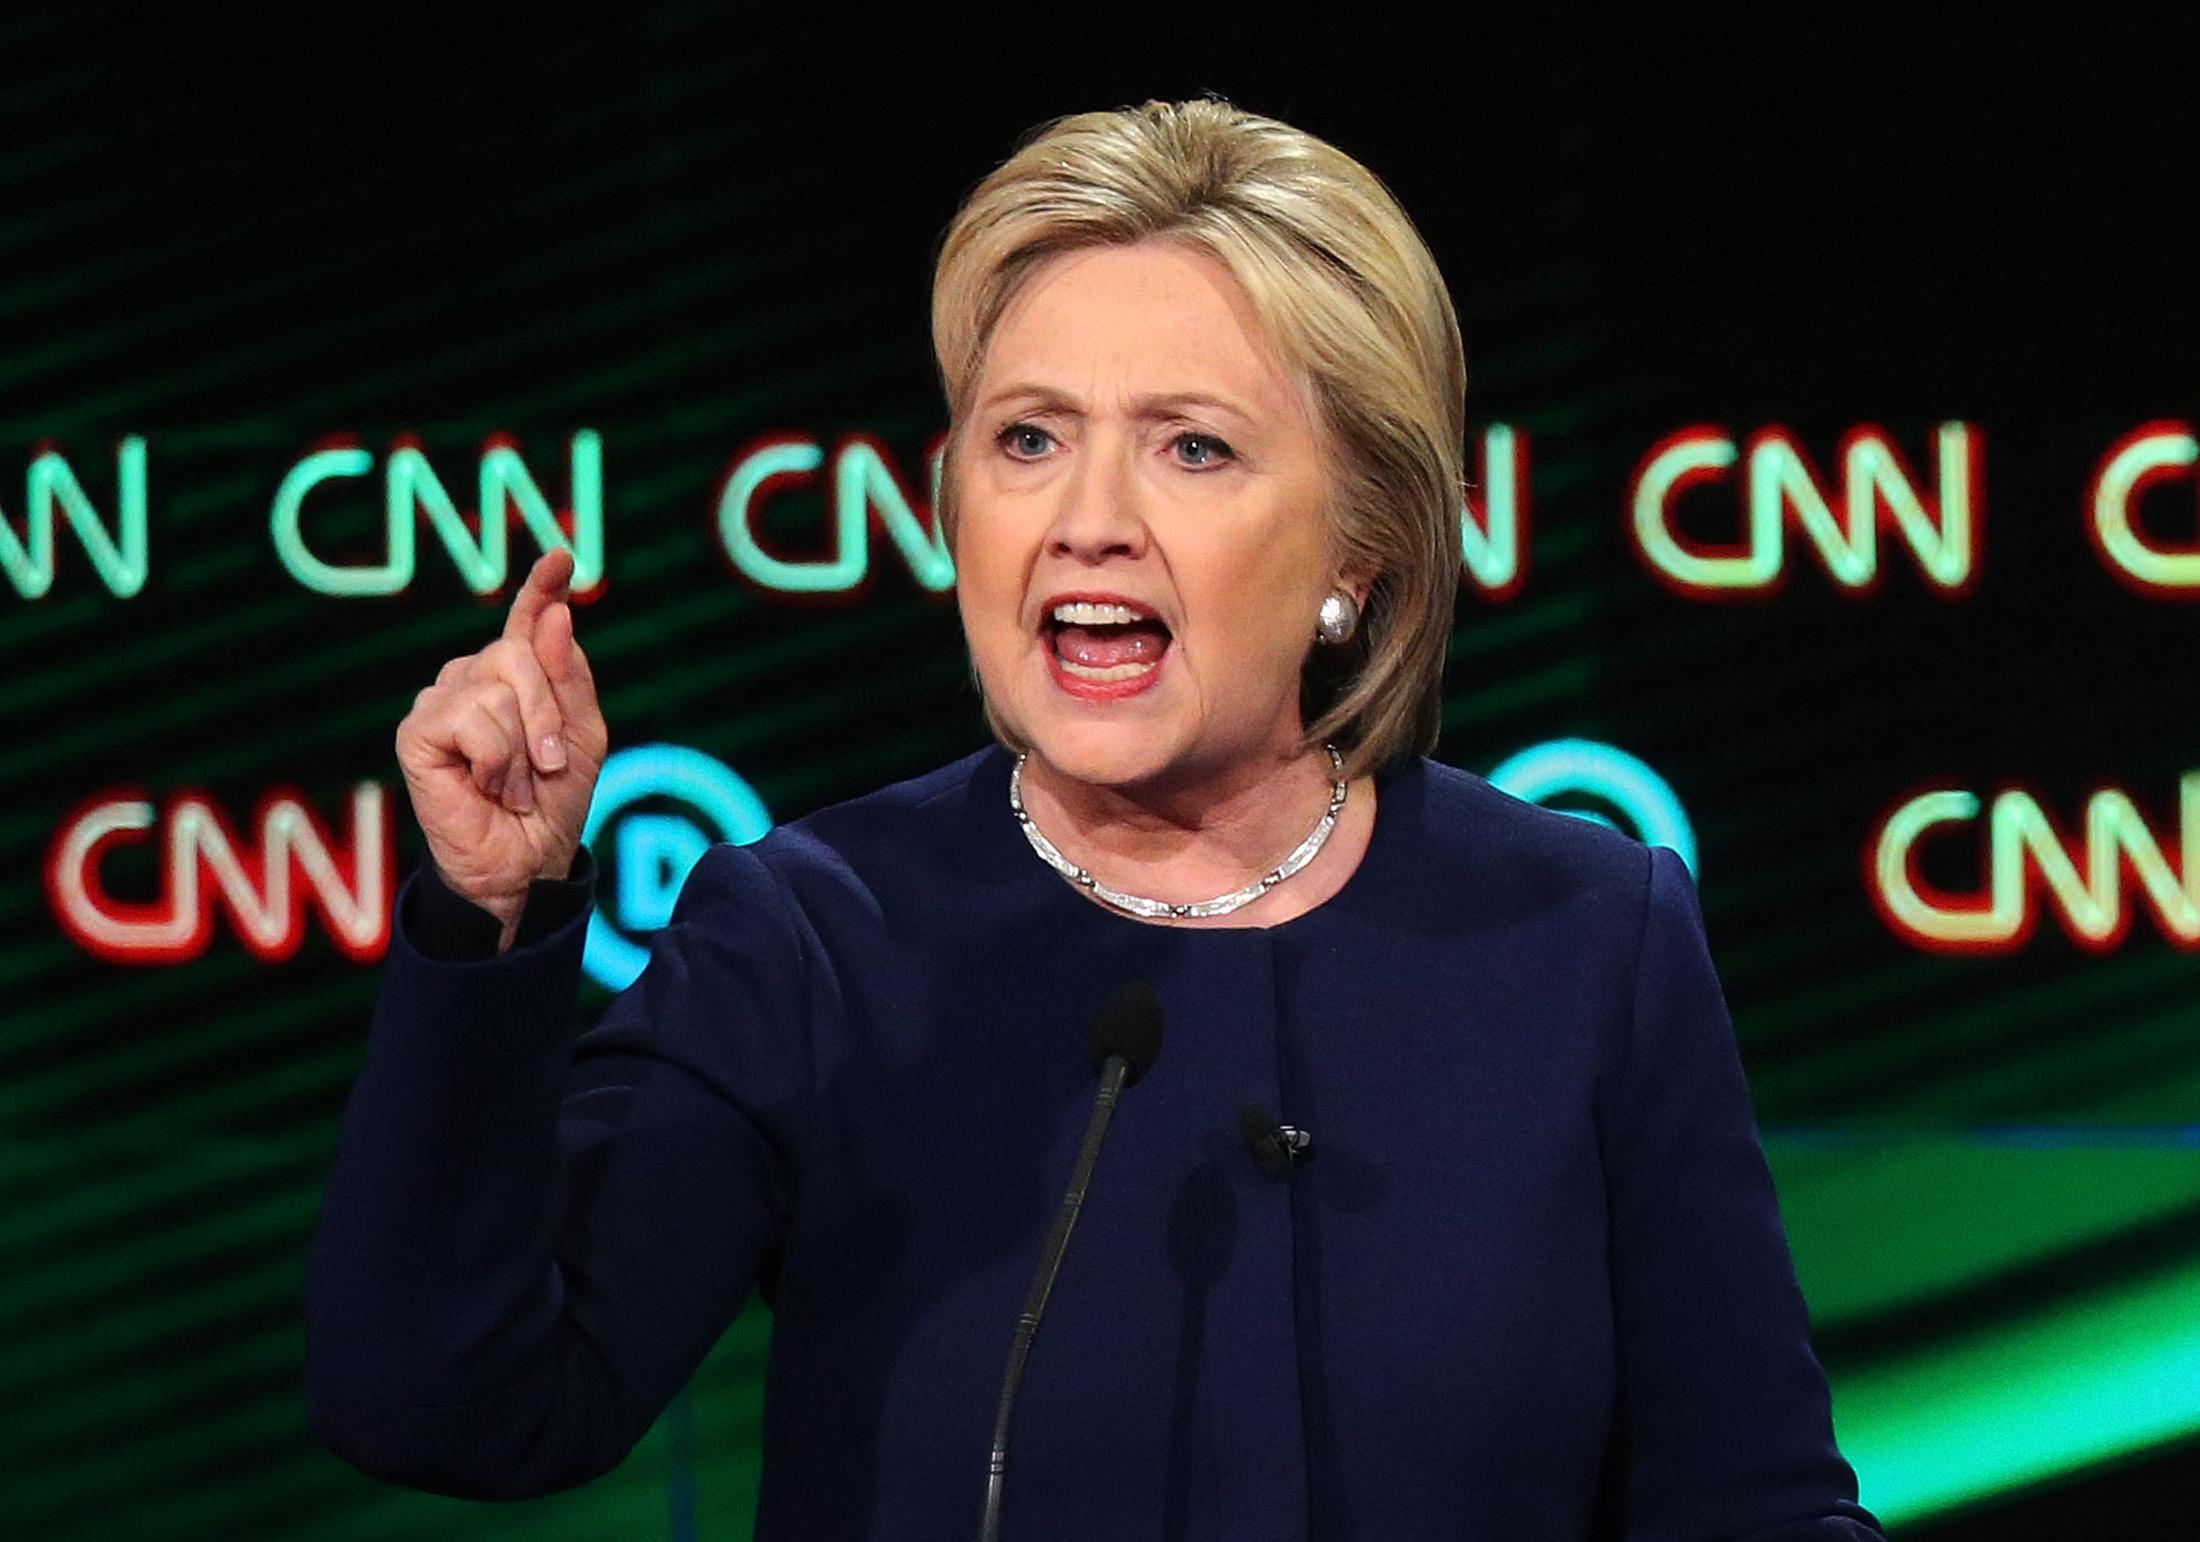 Clinton Doubles Down Against Fracking in Debate, Raising ...